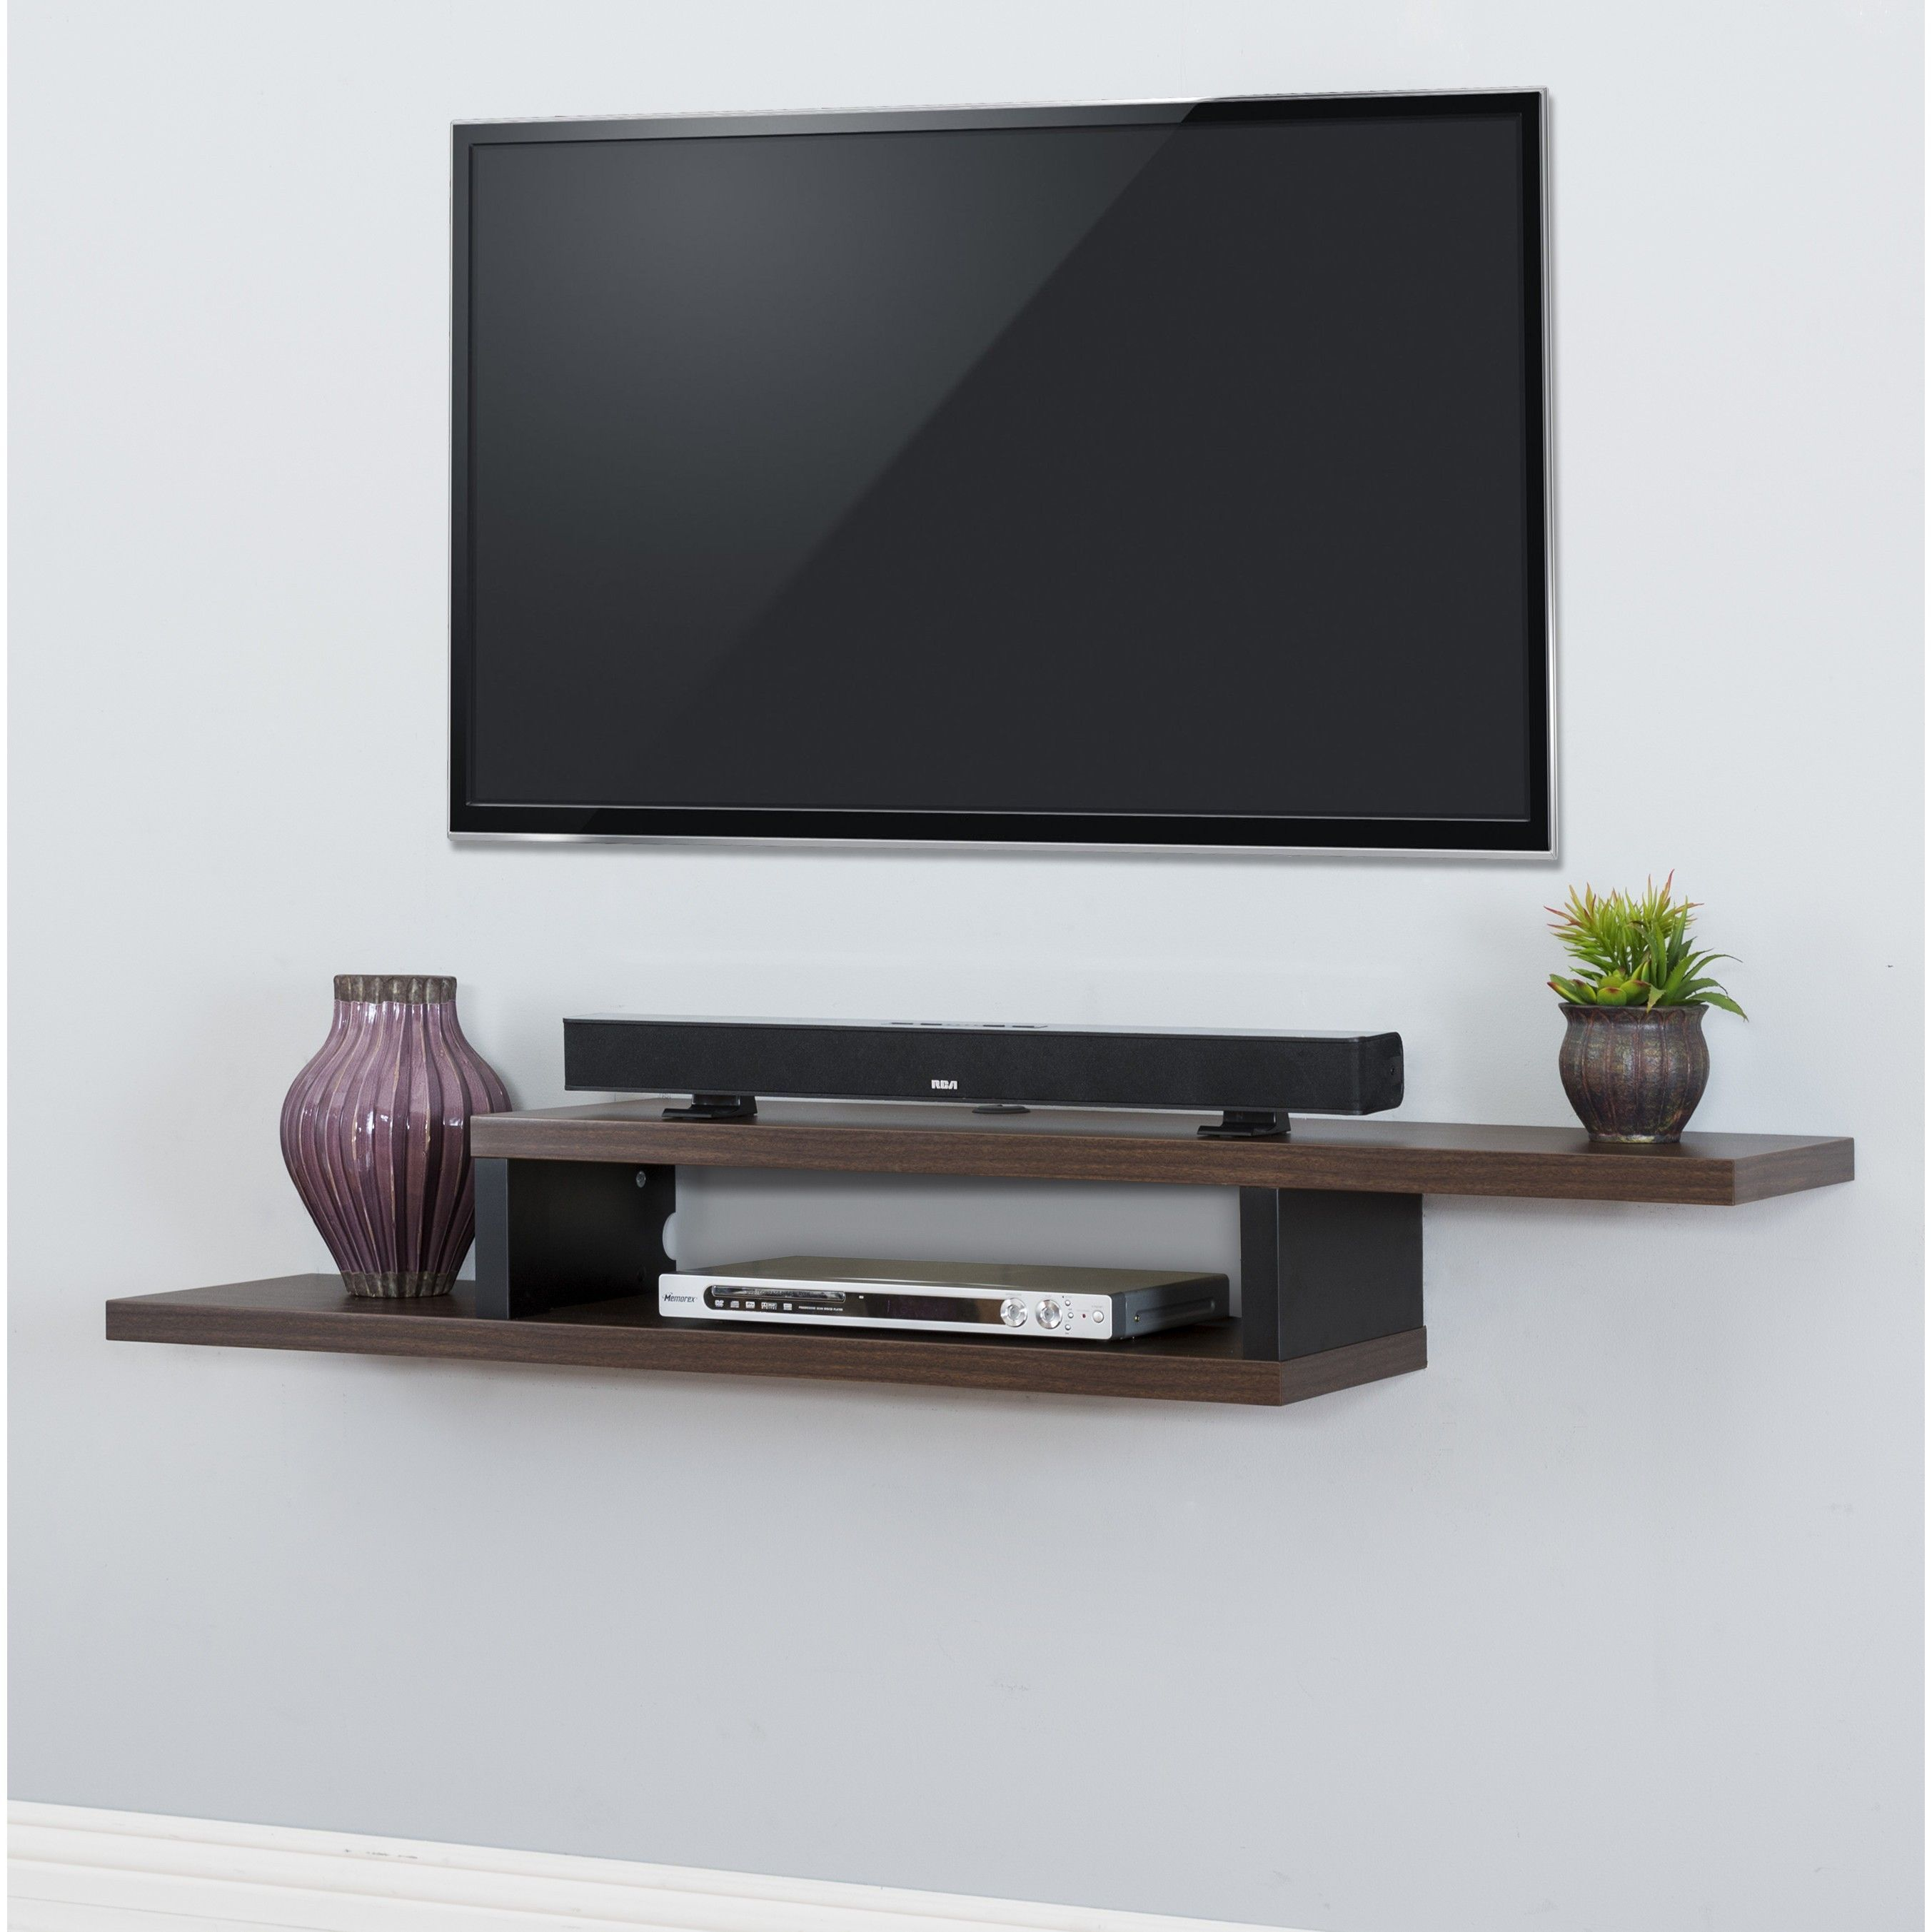 Minimalist Floating Tv Stand Designfloatingtvstand Wall Mount